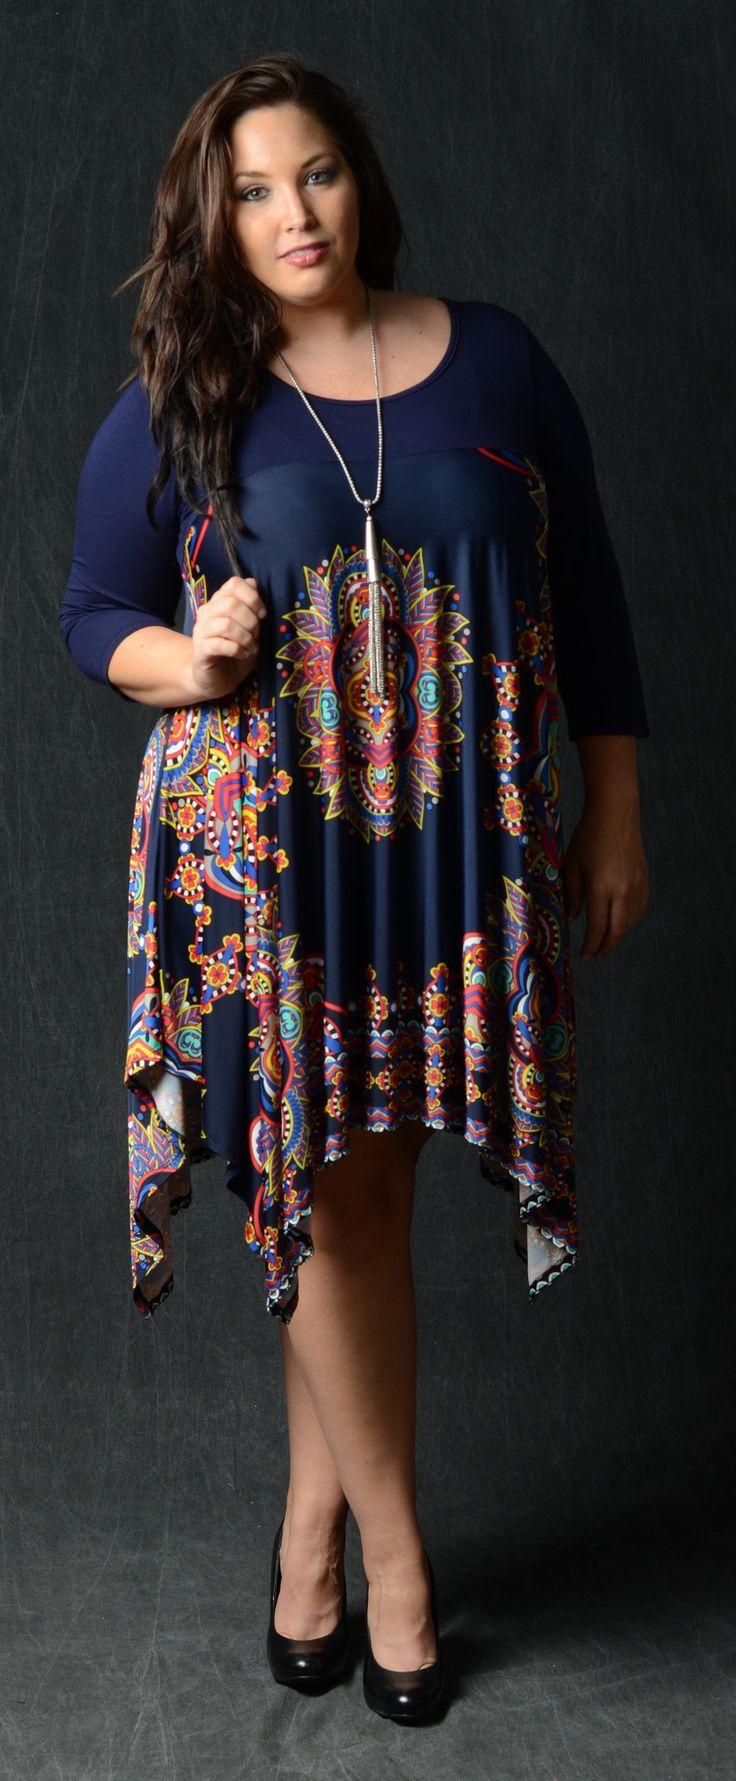 Asymmetrical Contrast Dress Mandala Print 92% Polyester 8% Spandex Made in the USA